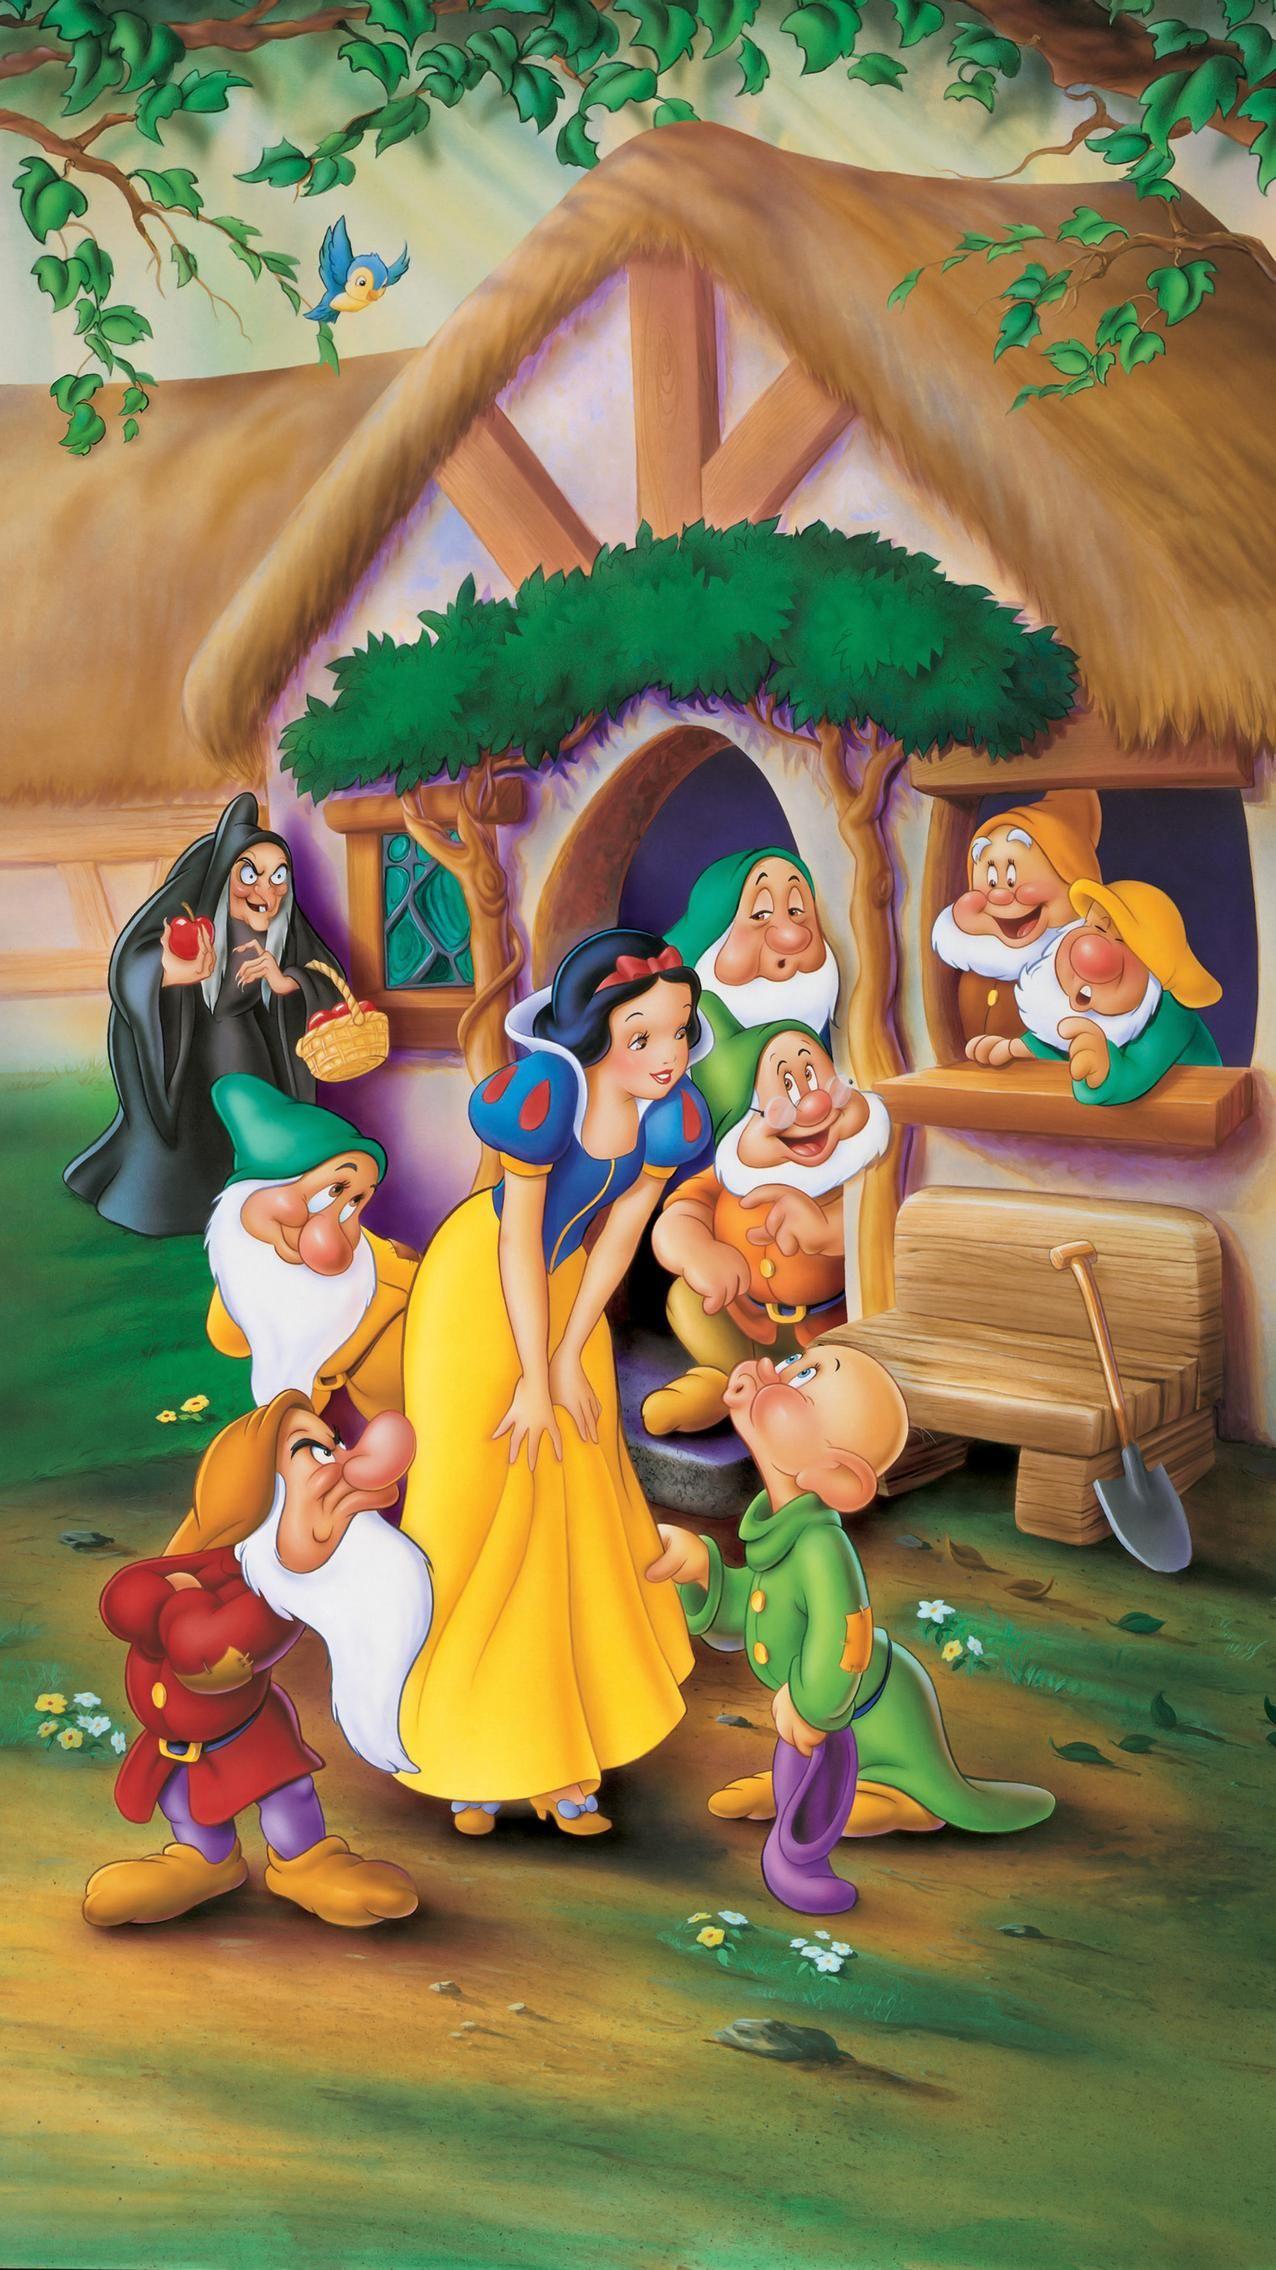 Snow White And The Seven Dwarfs 1937 Phone Wallpaper Moviemania Cute Disney Wallpaper Disney Princess Wallpaper Wallpaper Iphone Disney Disney wallpaper iphone snow white